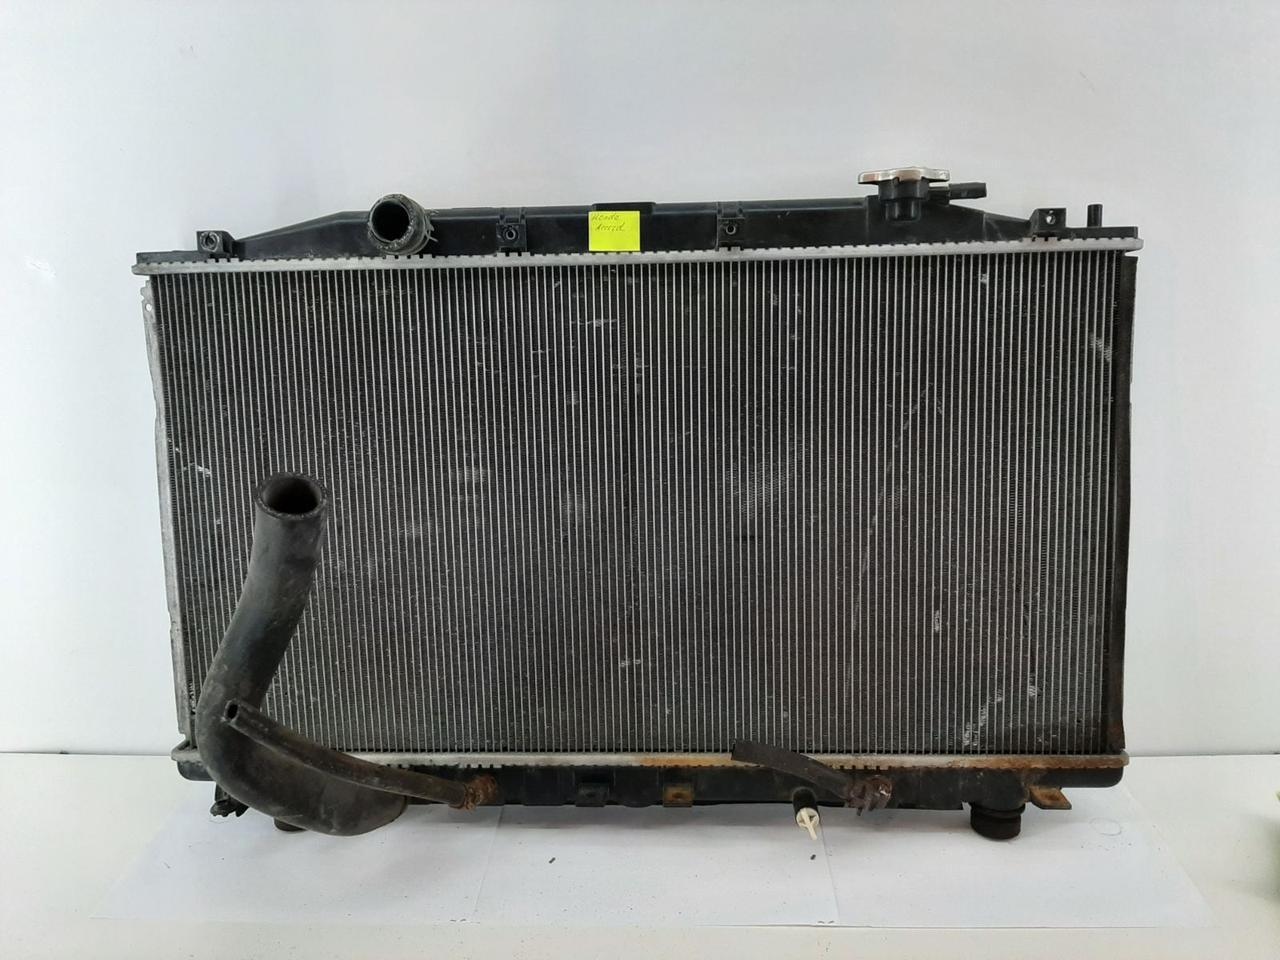 Радиатор Honda Accord VII 2003-2008 гг 19010RBBE51